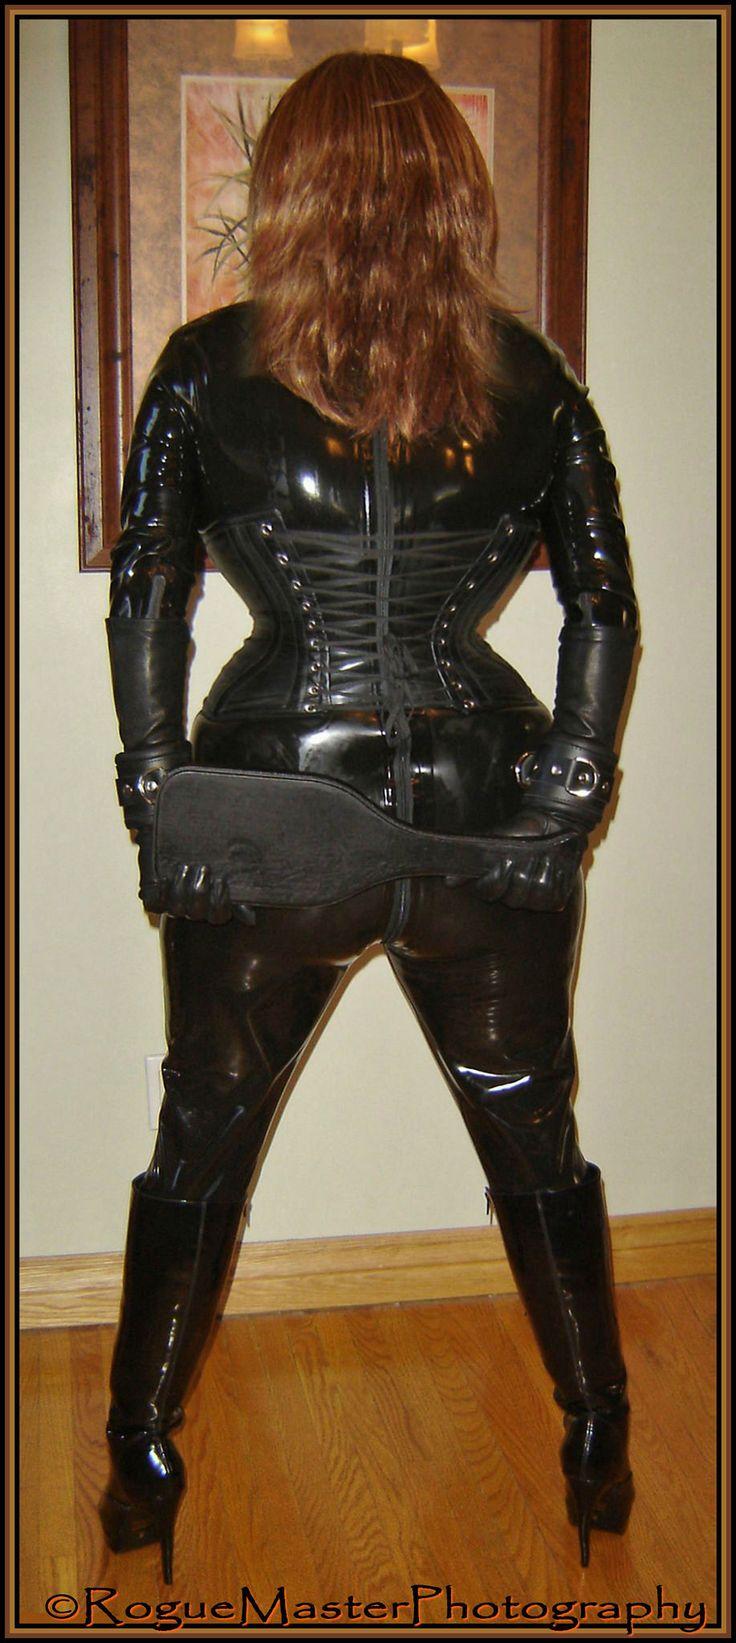 Bbw spike heeled boots shopping - 5 2